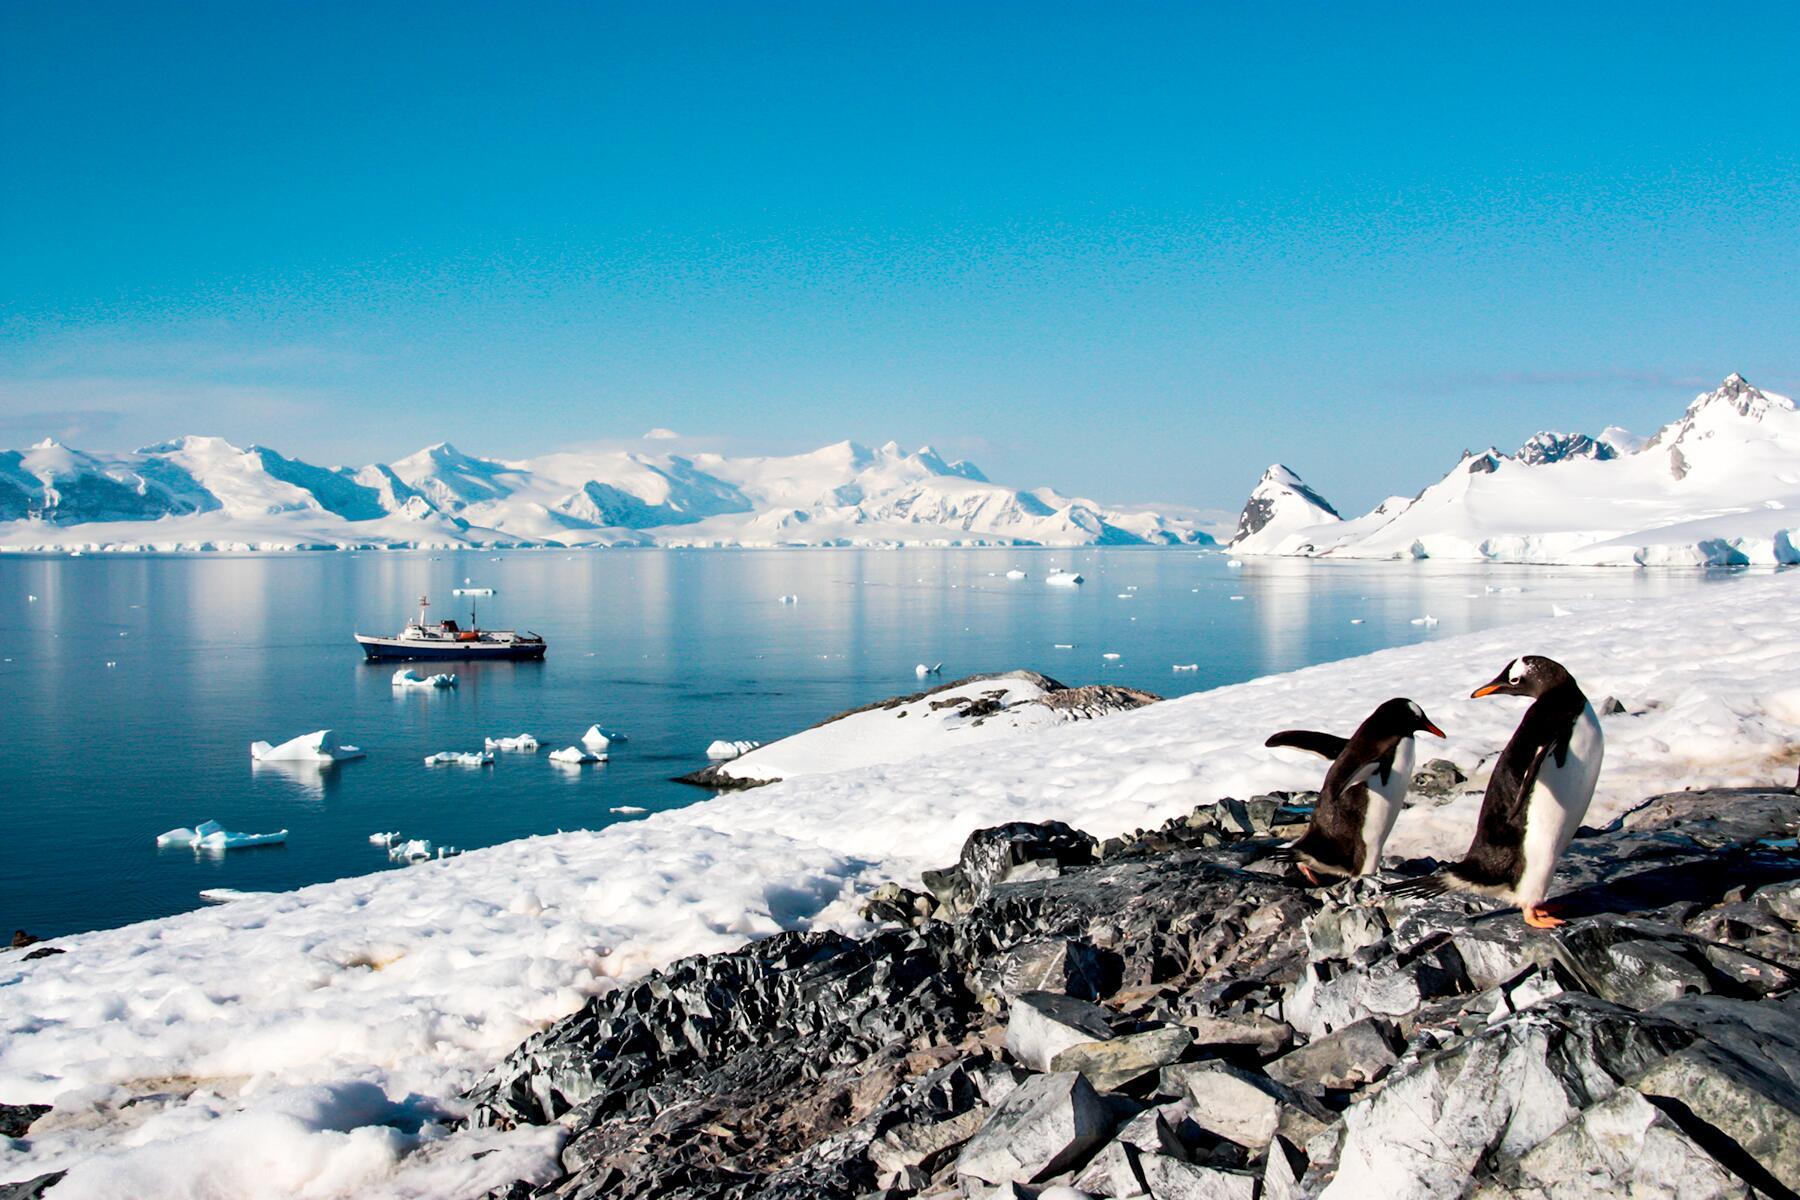 06_UnexpectedHoneymoons__TakeaCruisetoAntarctica_6.) Antarctica ship and two penguins - Courtesy of Adventure Life